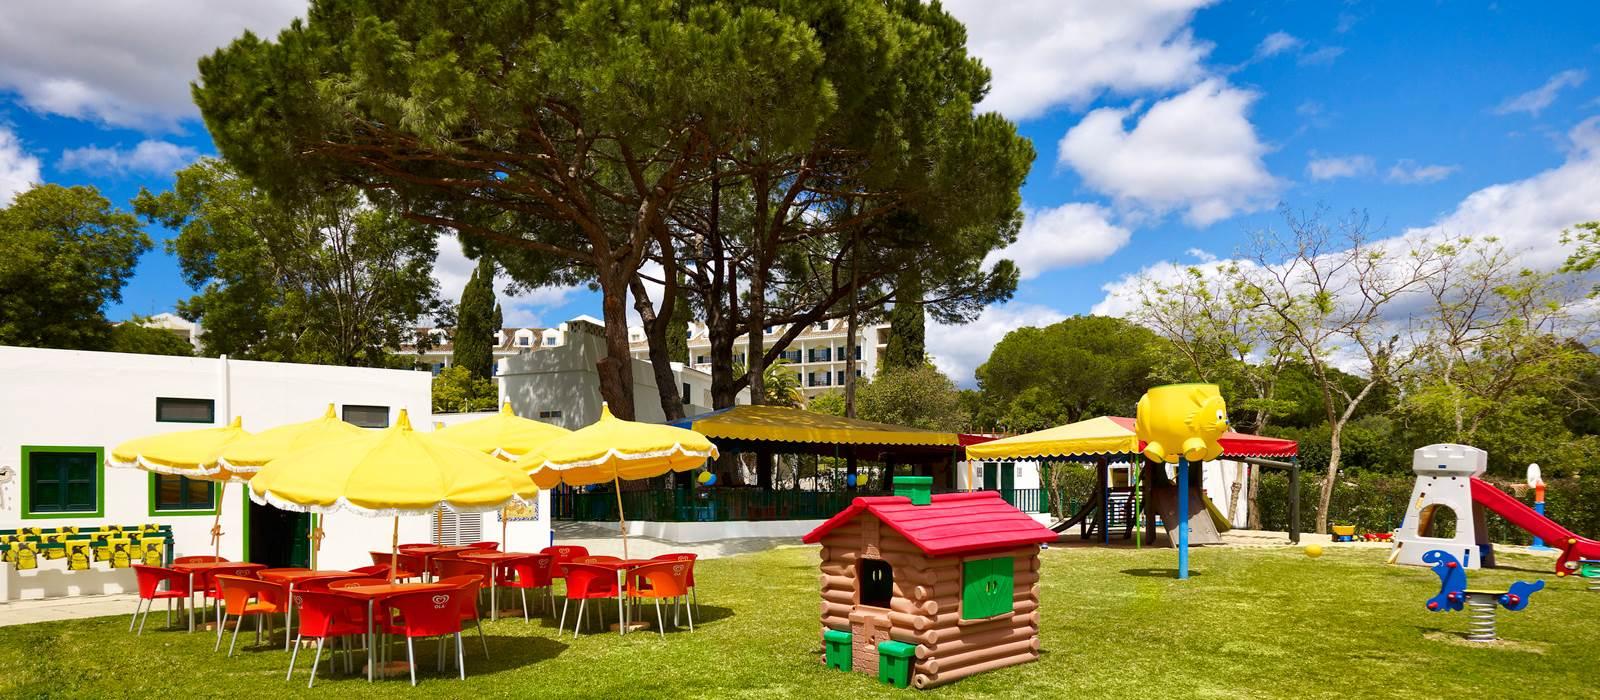 Kangaroo Kids Club Birthday Party Penina Hotel amp Golf Resort